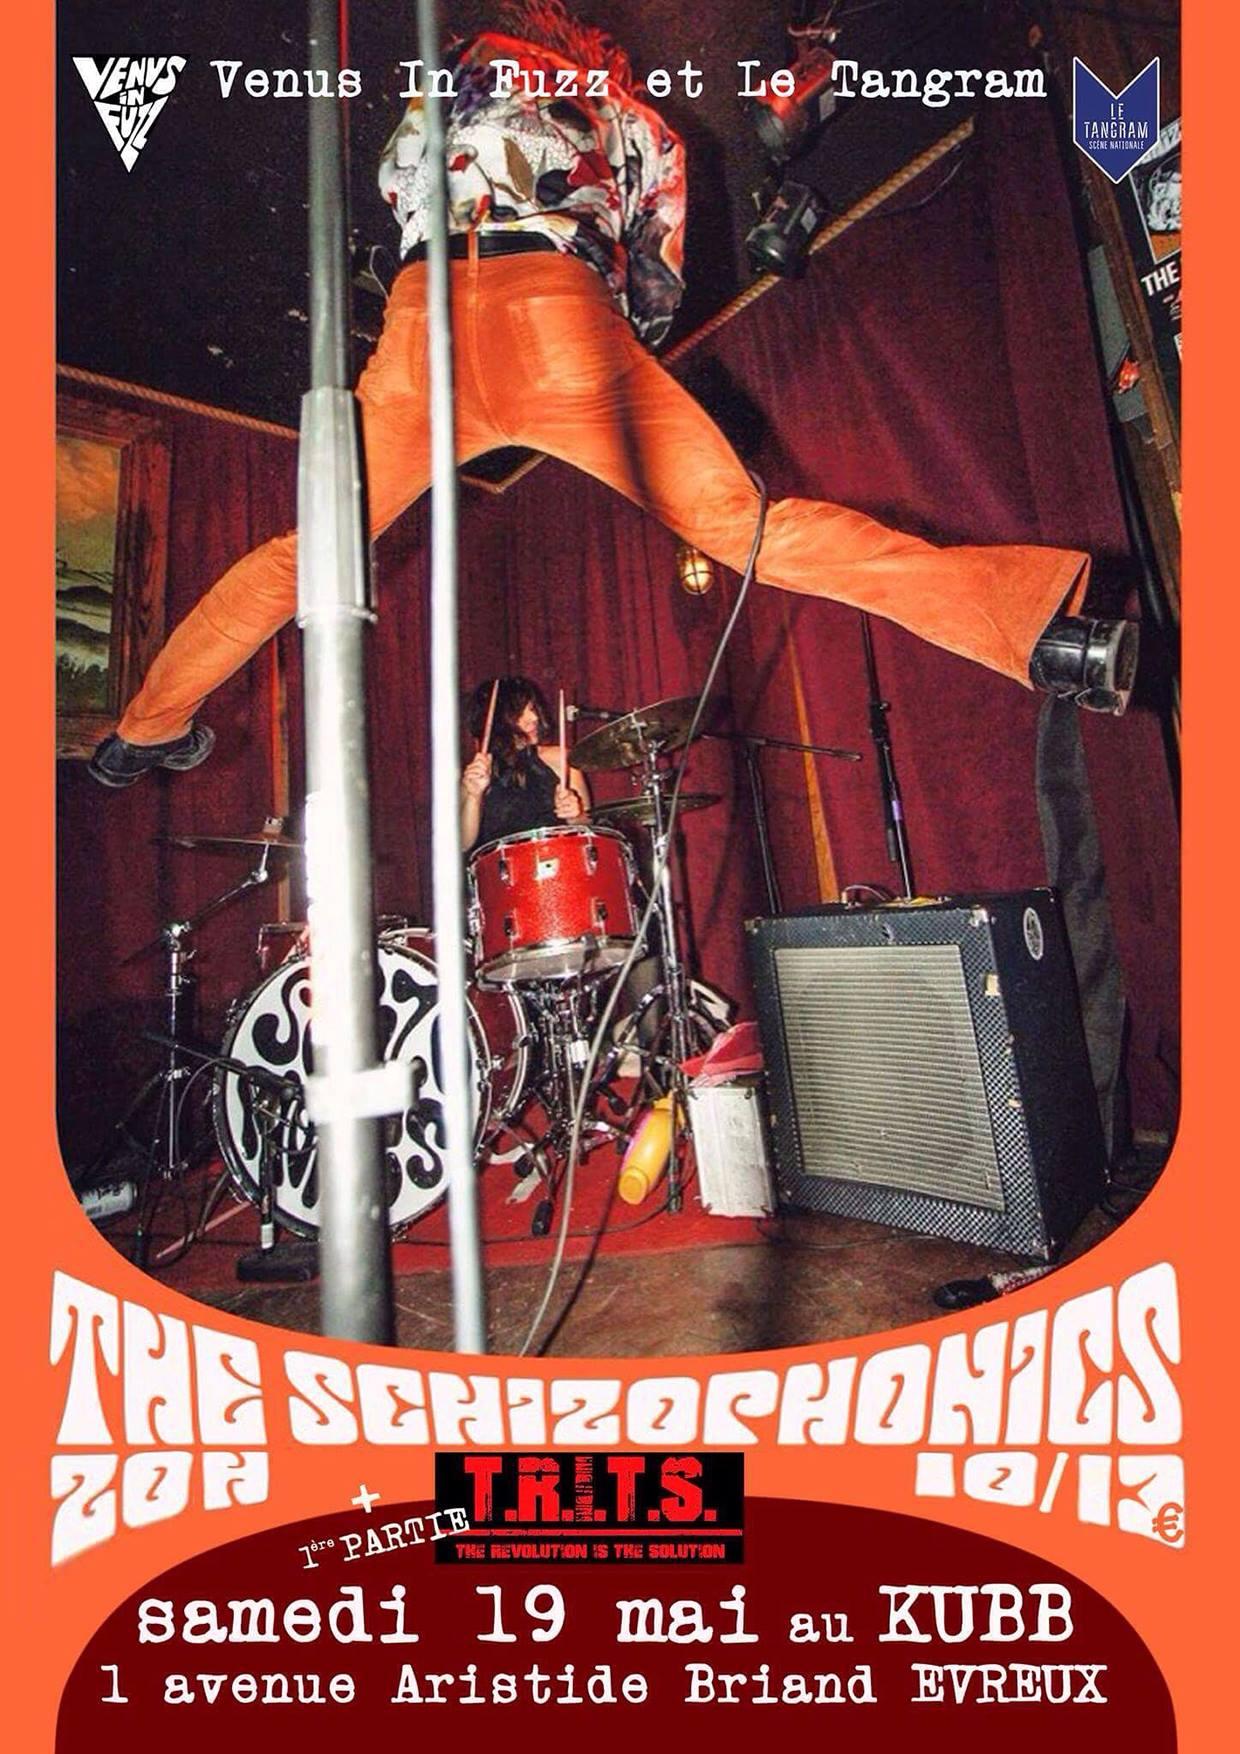 THE SCHIZOPHONICS + TRITS